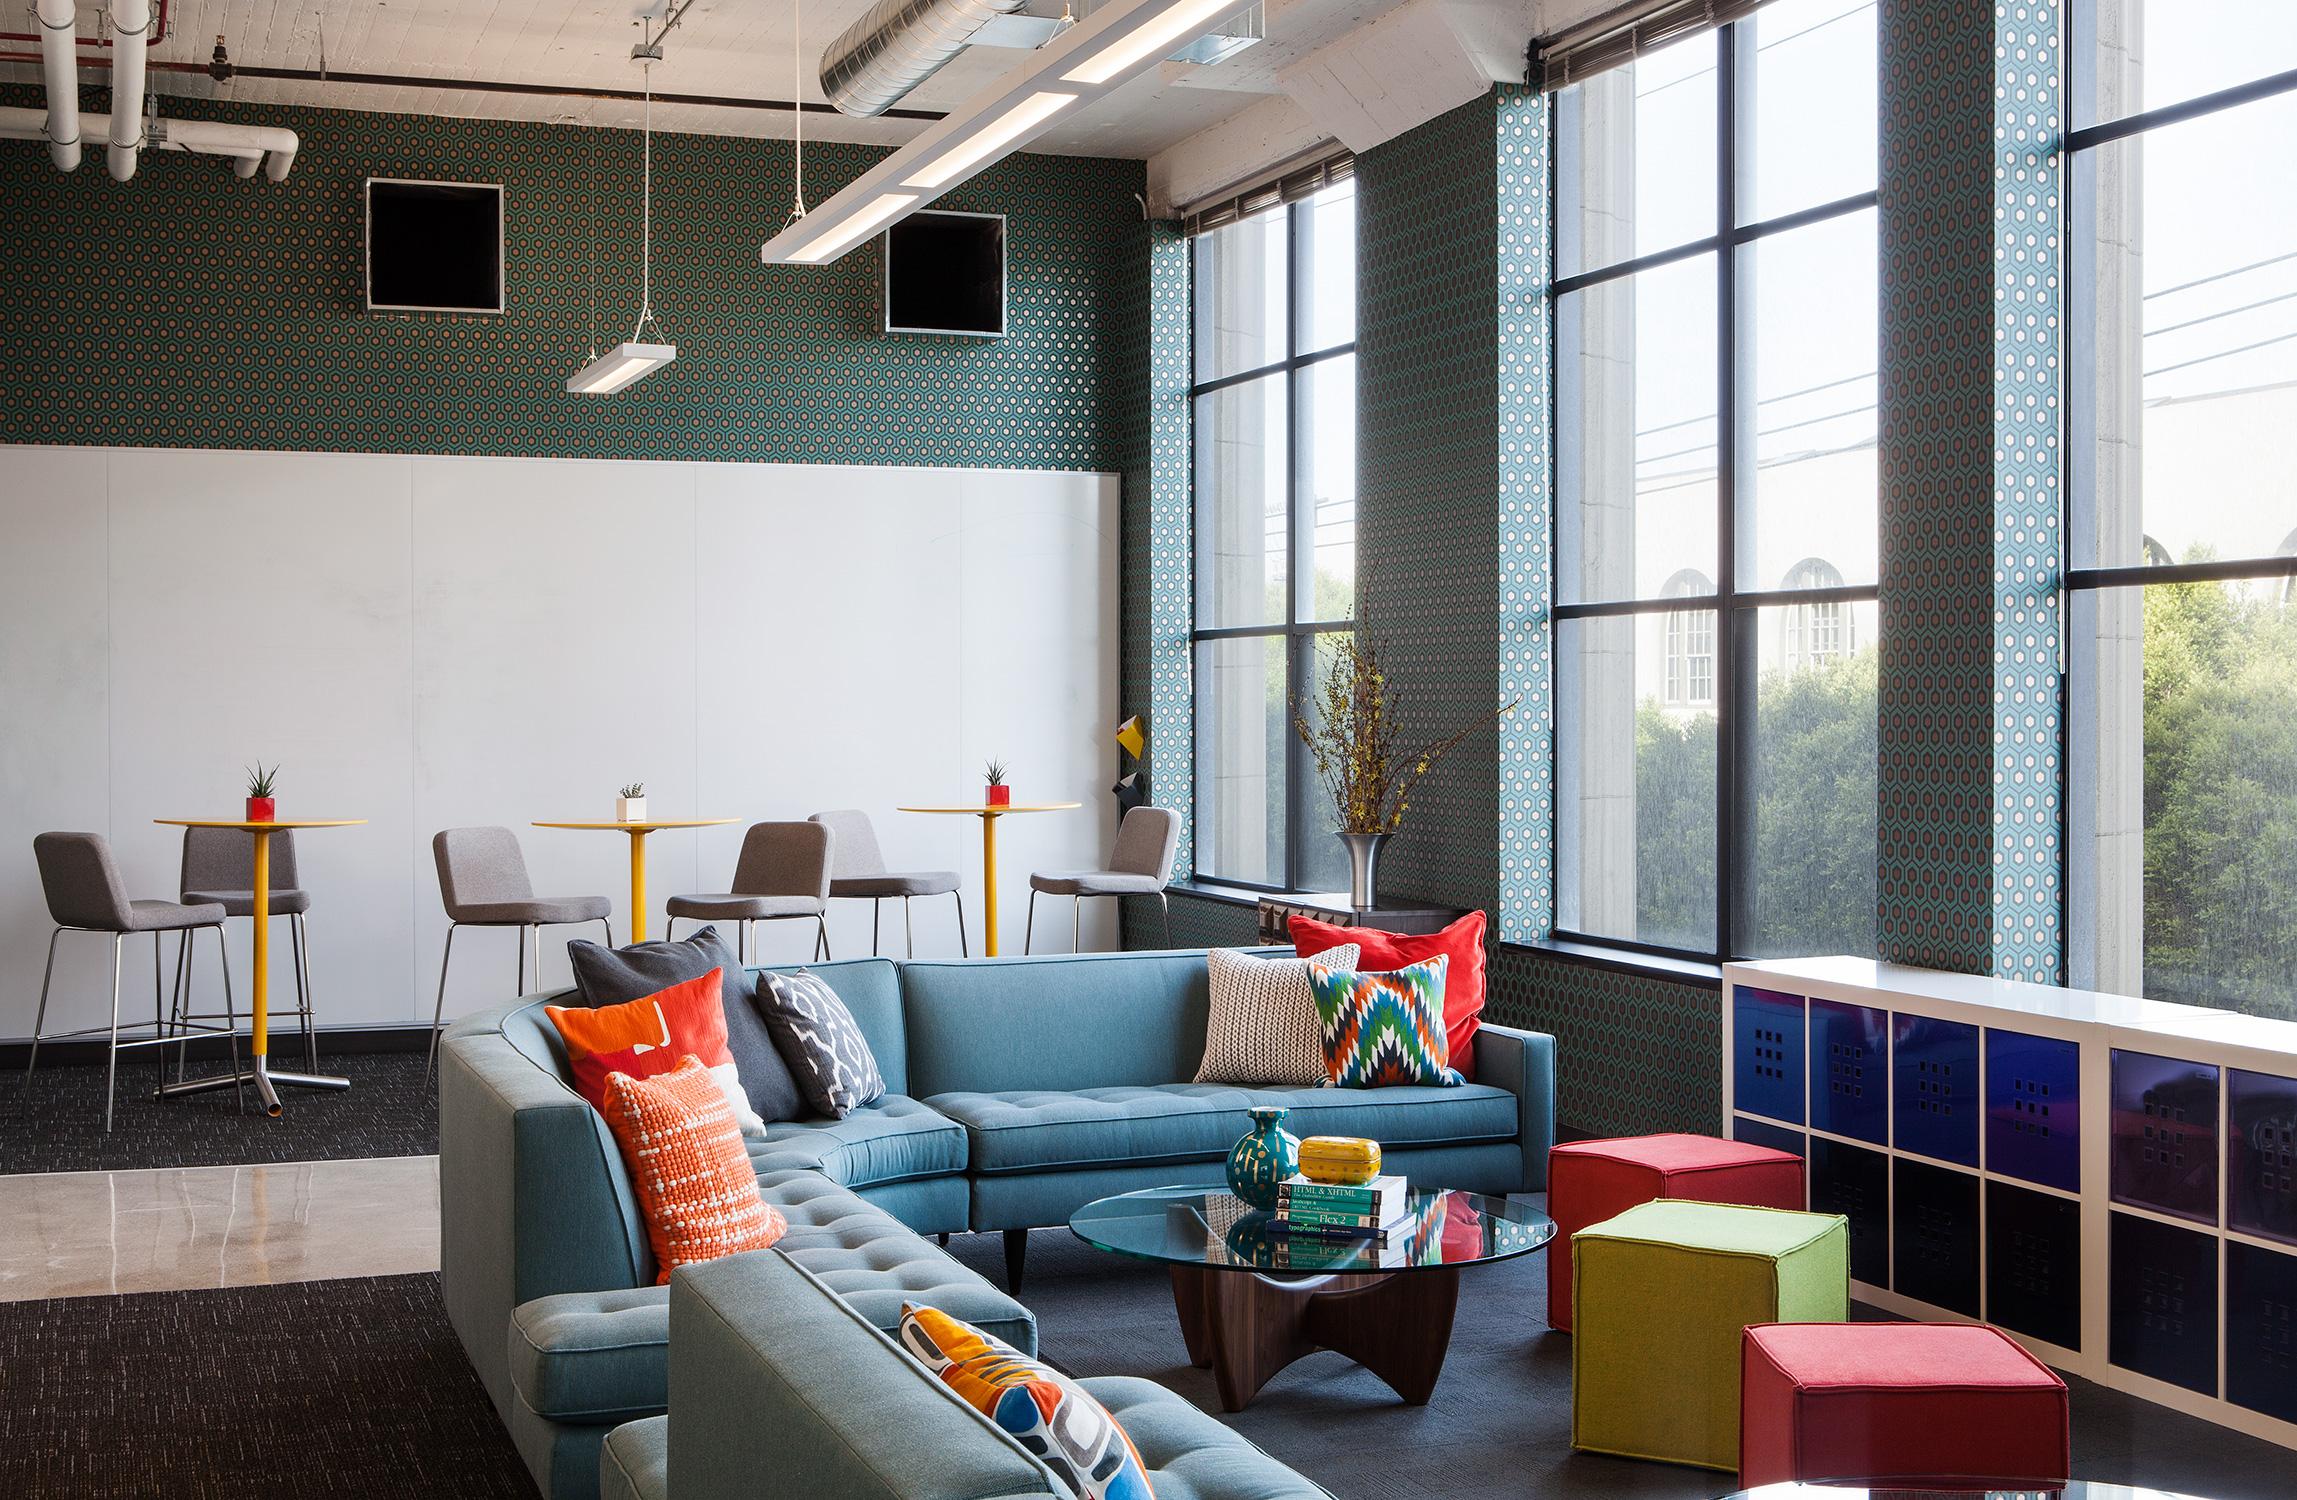 Janel Holiday Interior Design Dolores Area 1.jpg